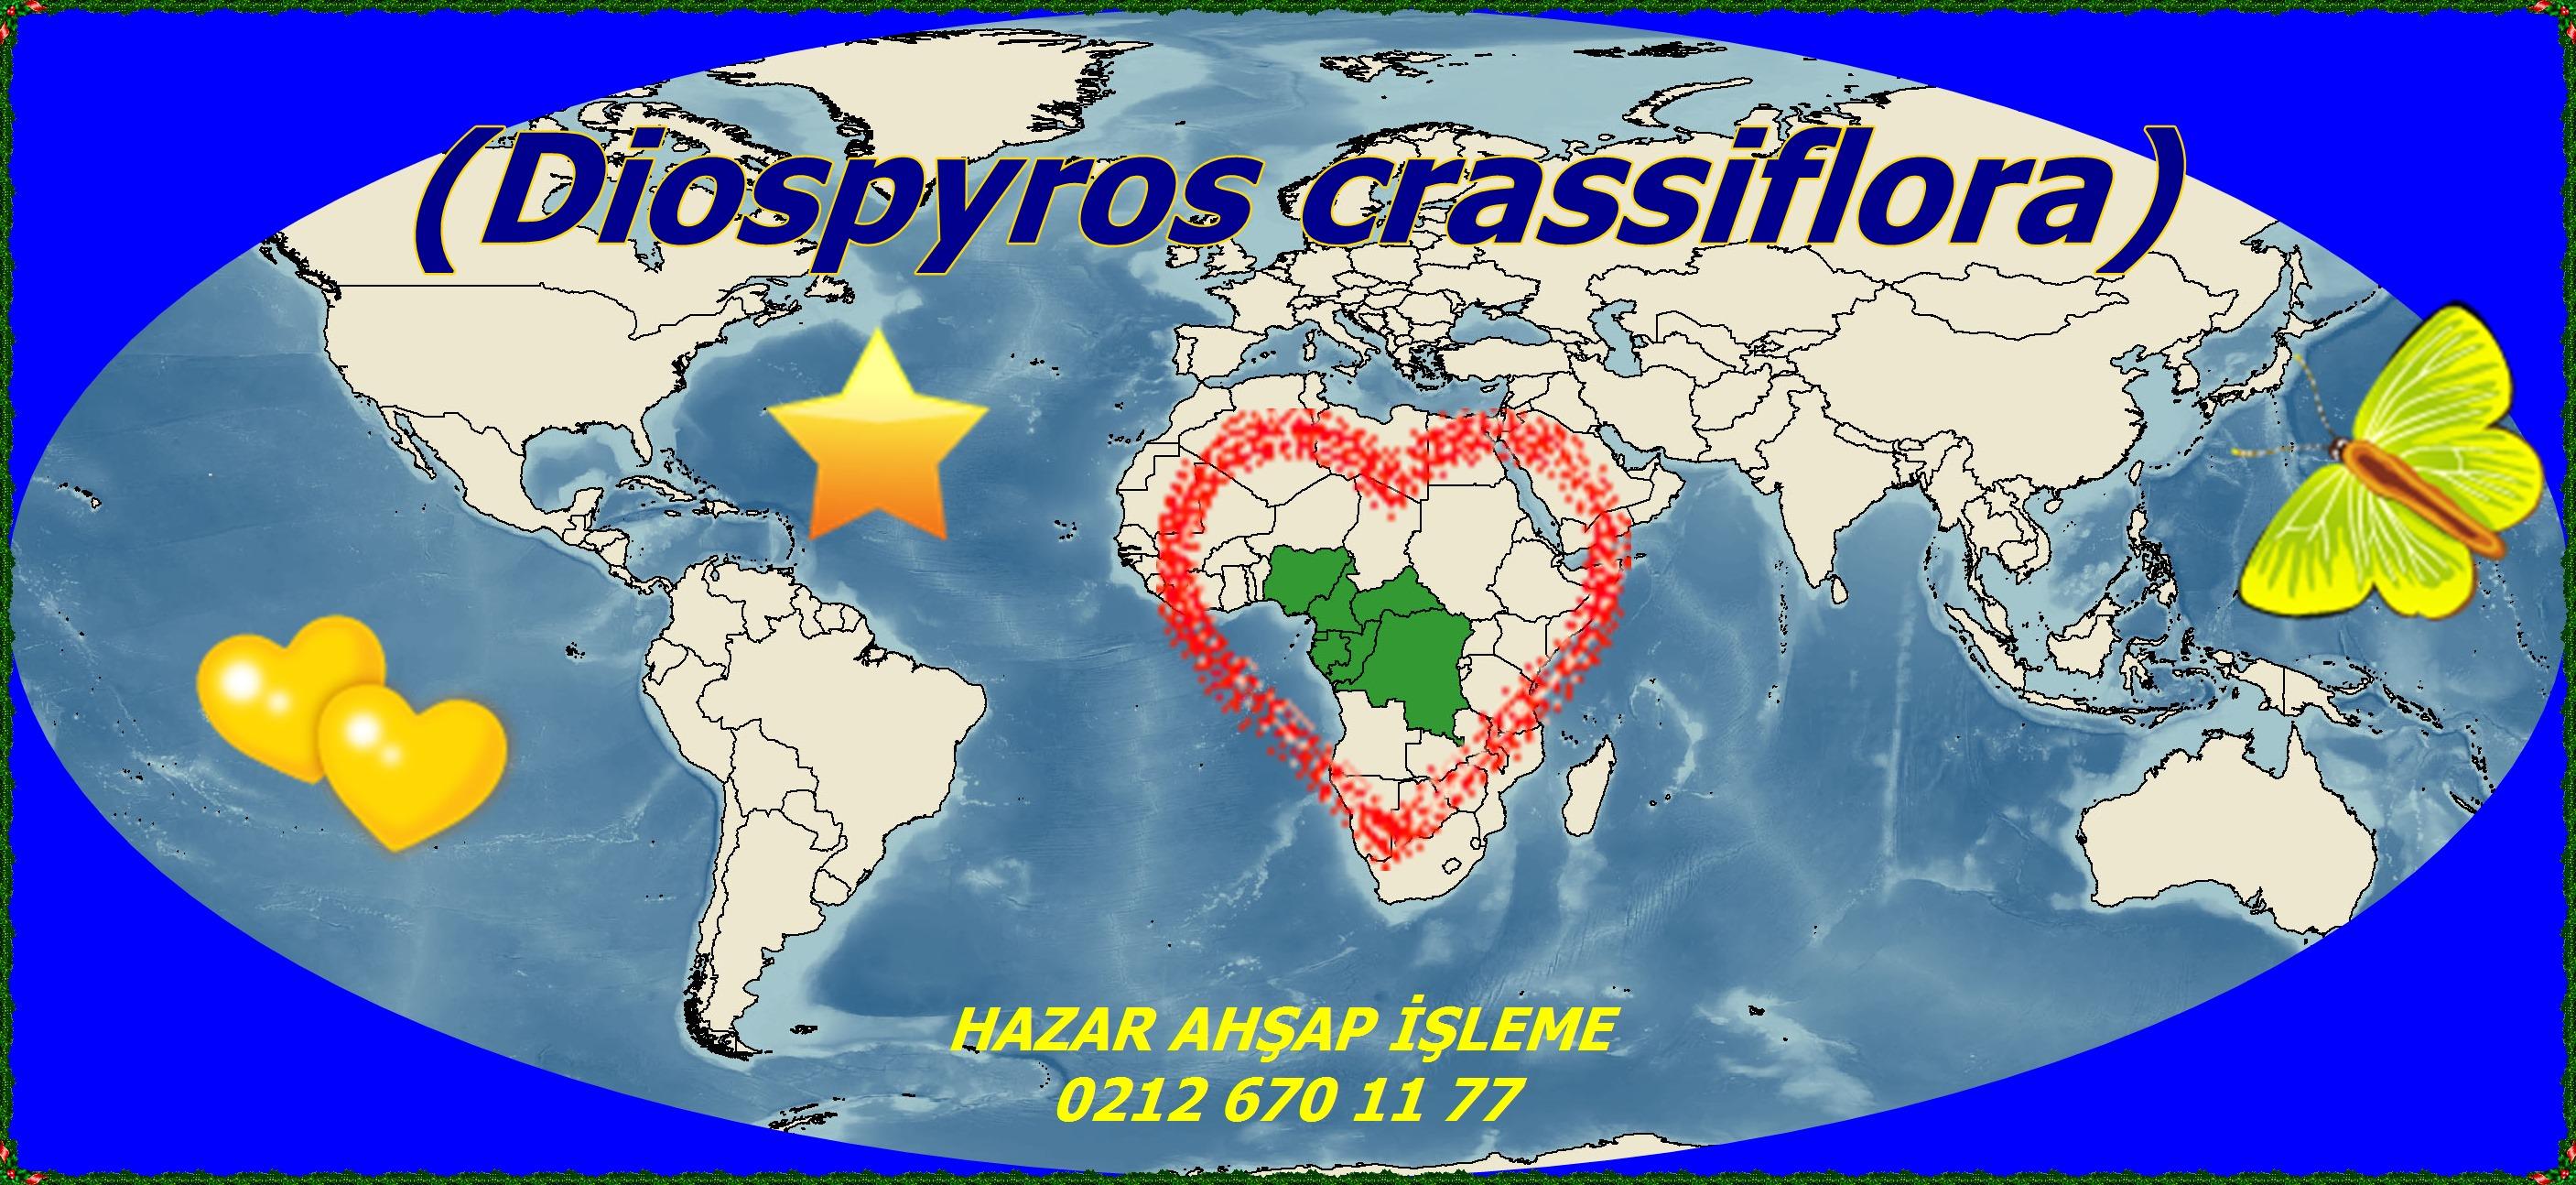 Diospyros_crassiflora_map(Diospyros crassiflora)